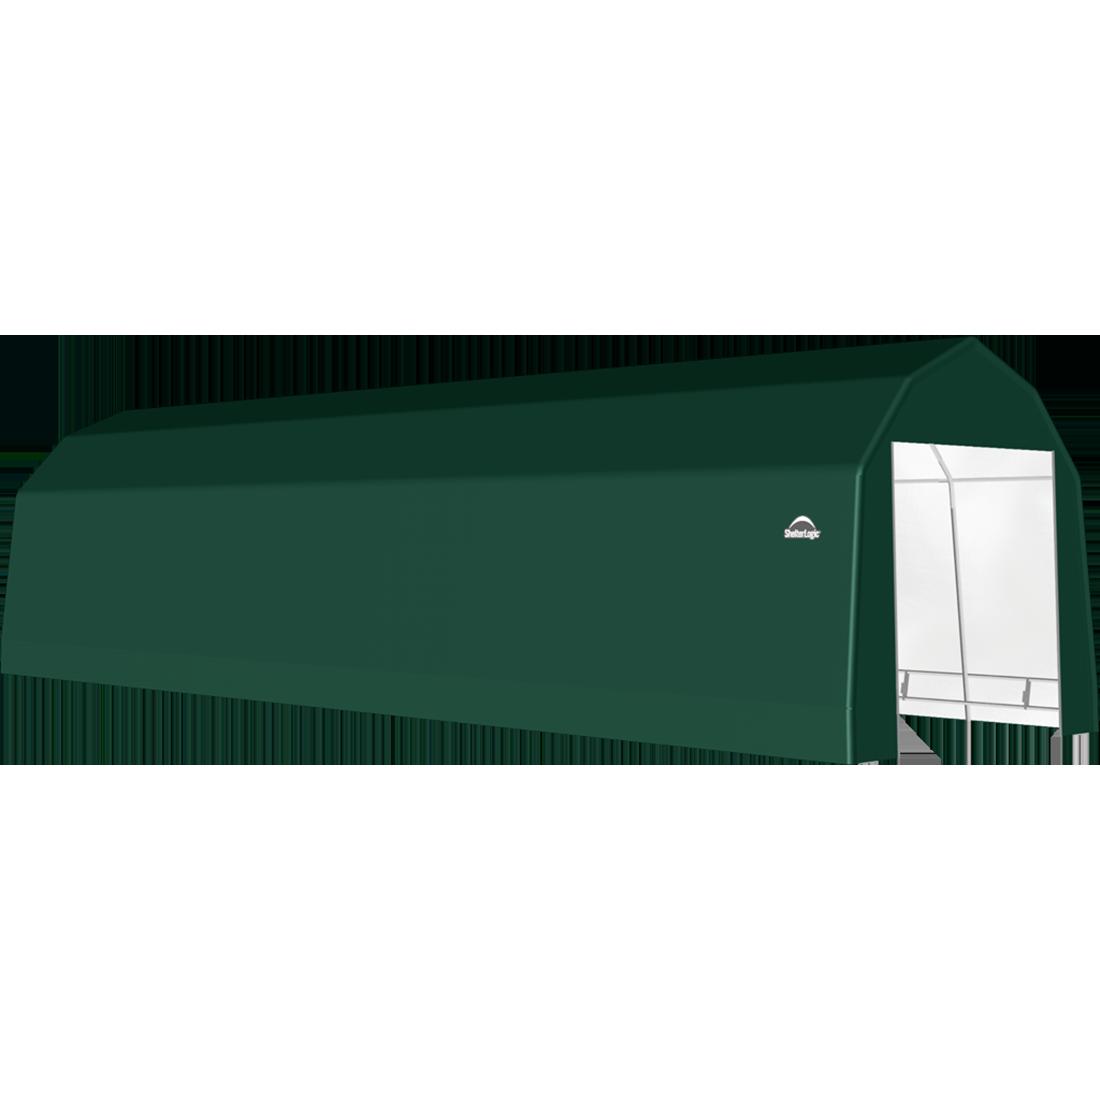 SP Barn 12X44X11 Green 14 oz PE Shelter